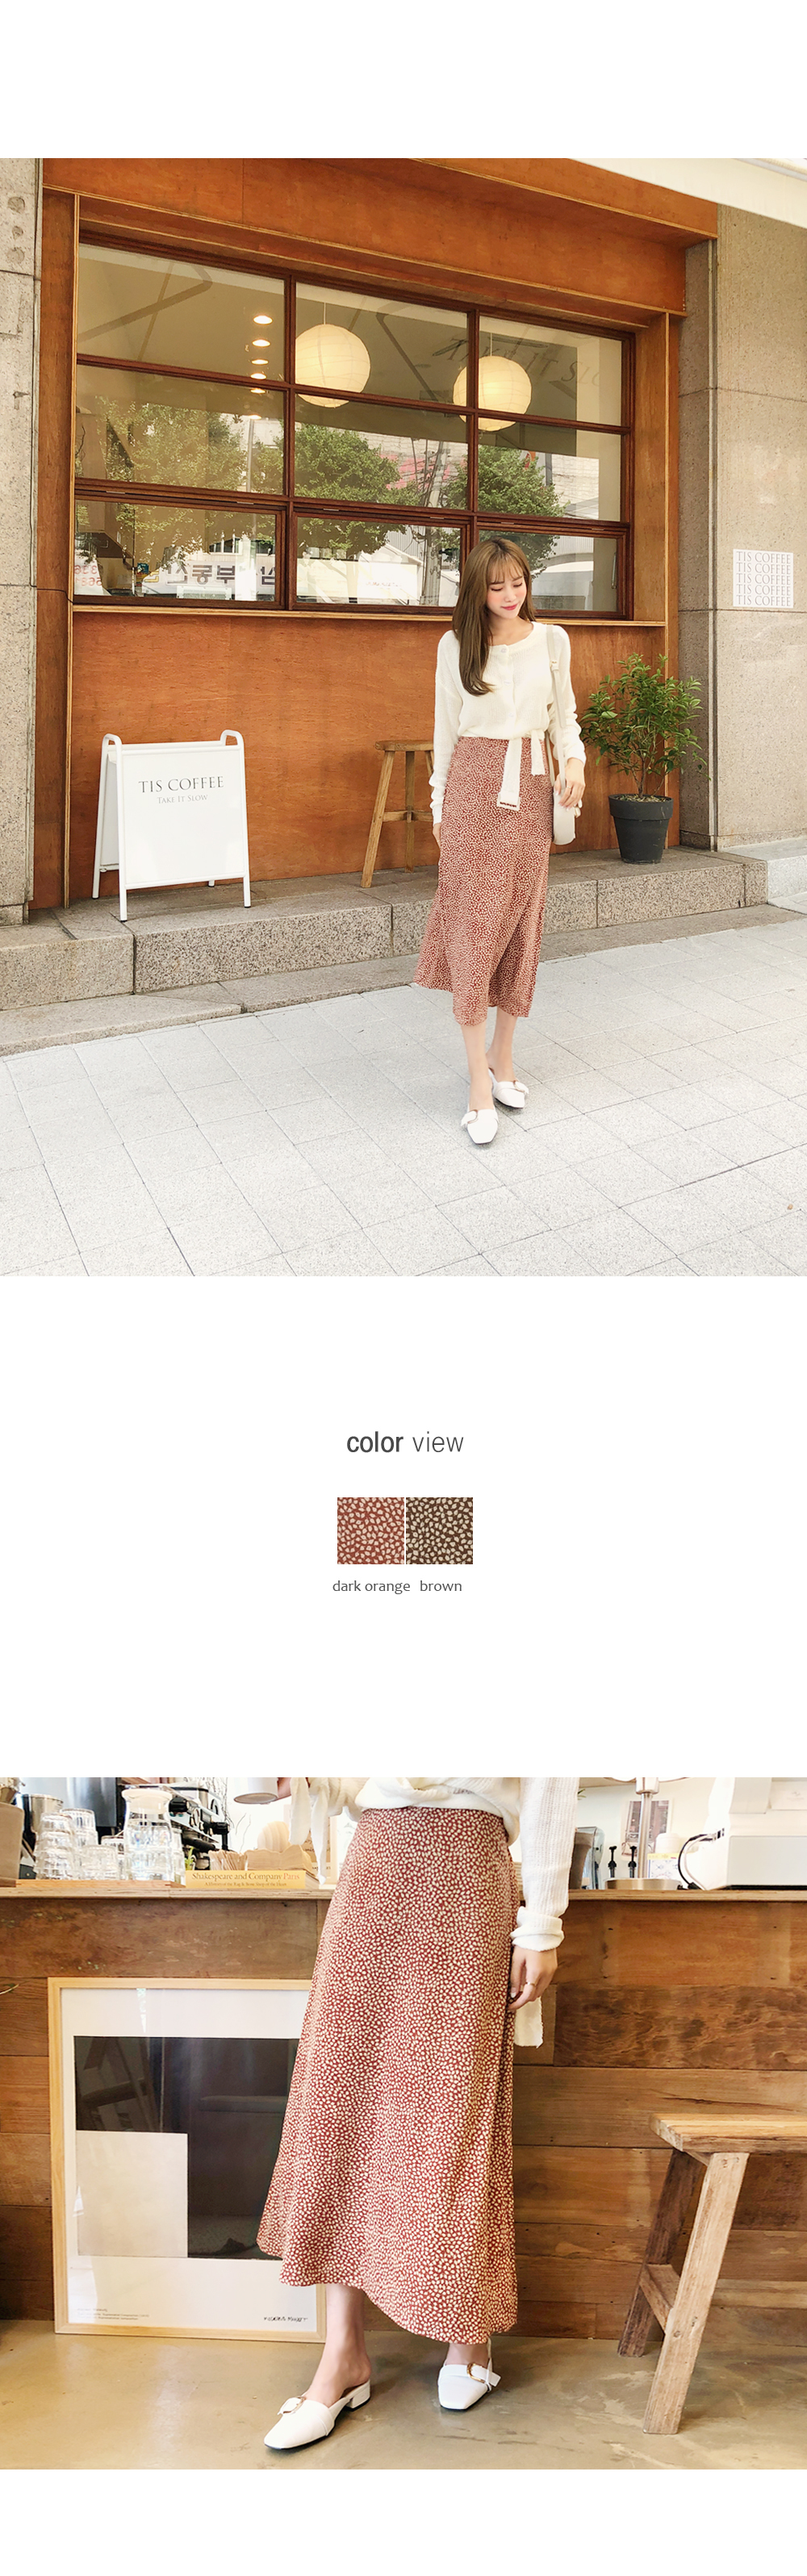 Calm leaf skirt